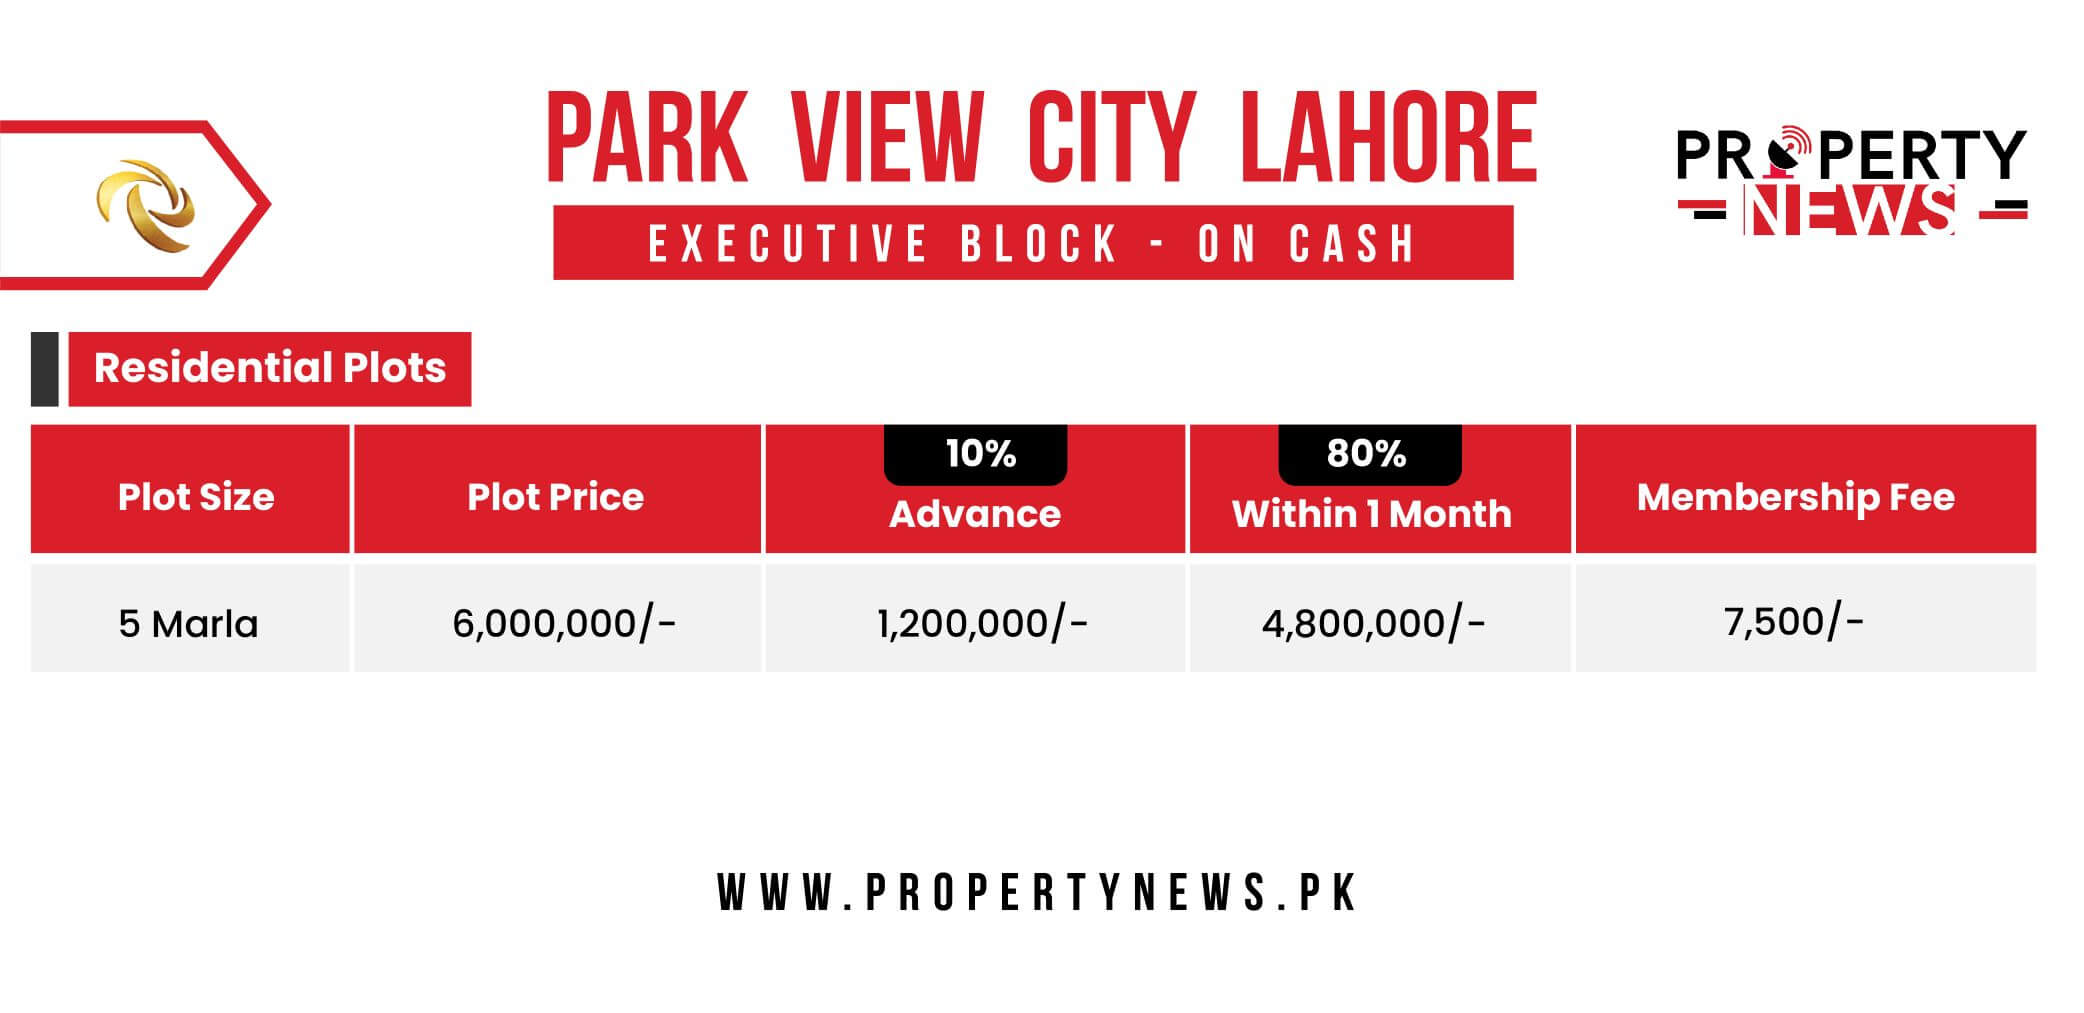 Park View City Lahore Payment Plan Executive Block Residential plots